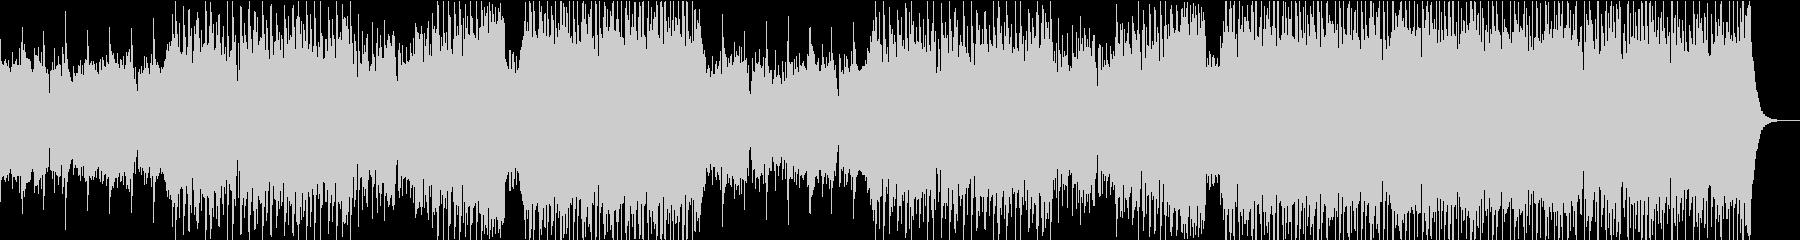 Husky voice, POPS, tropical's unreproduced waveform